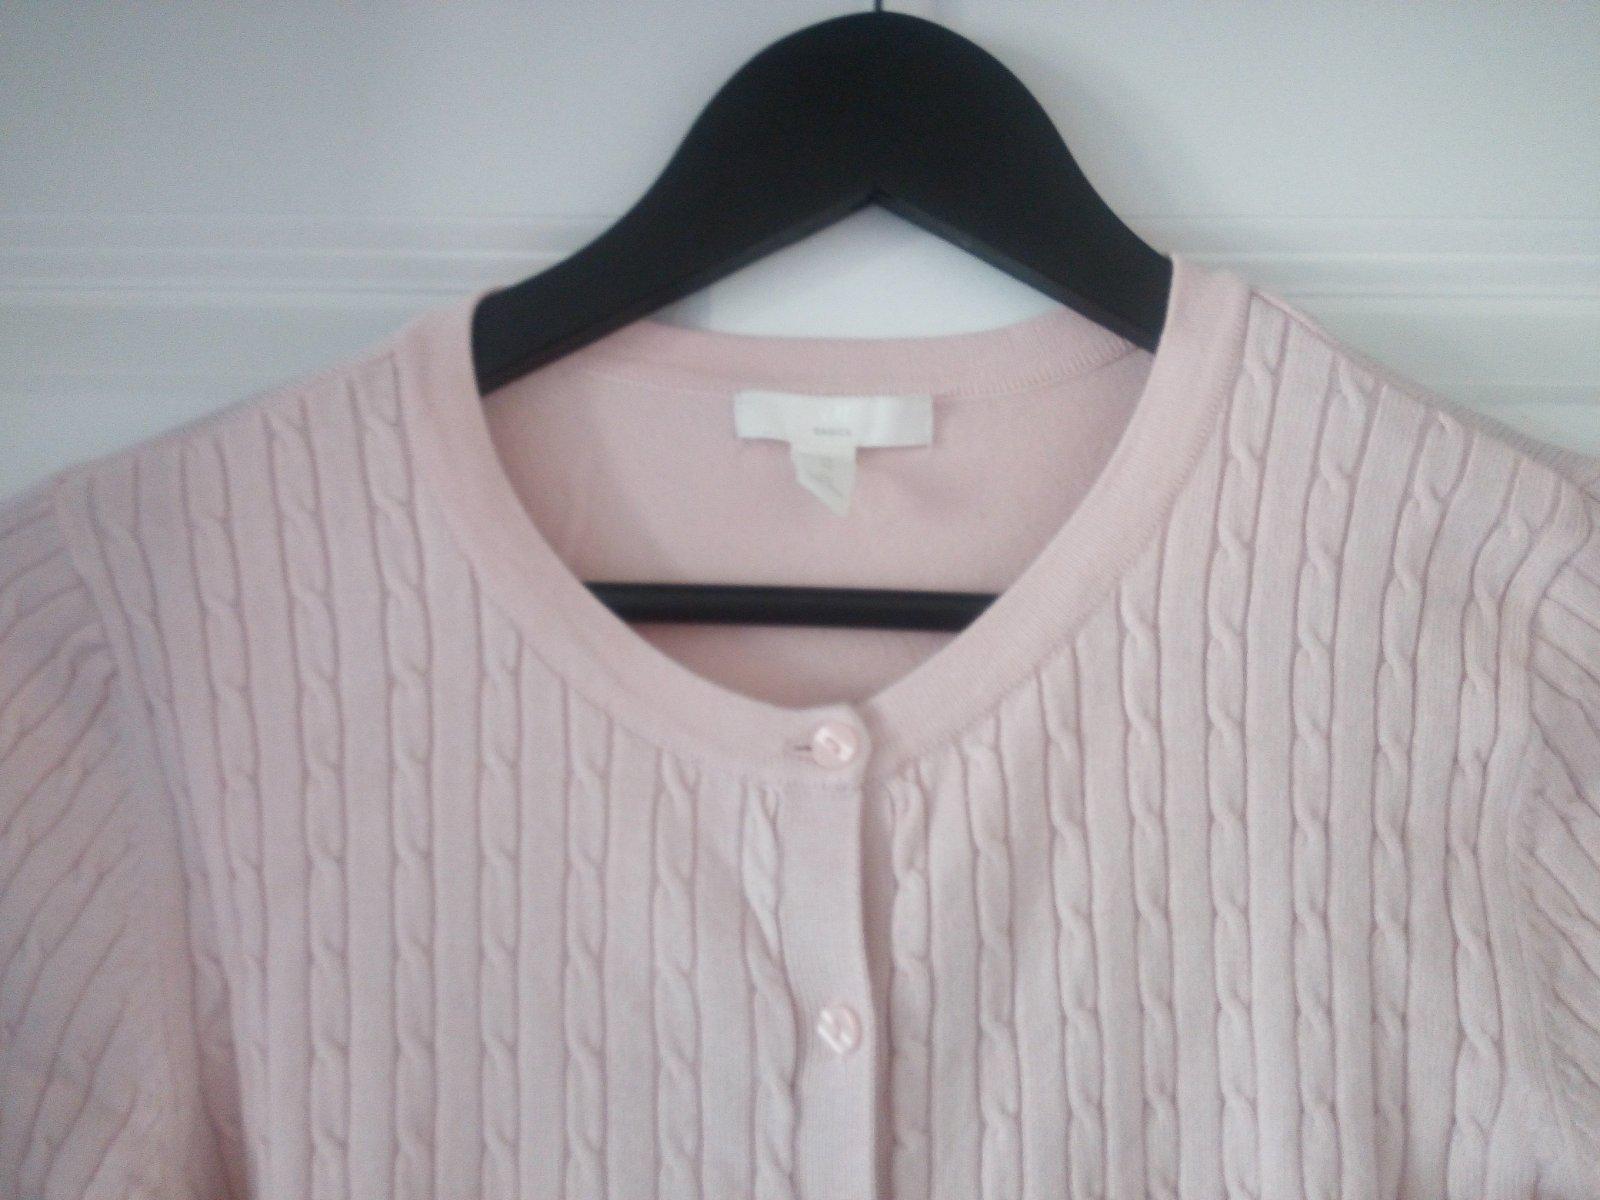 Bledoružový svetrík H&M, XS - Obrázok č. 2